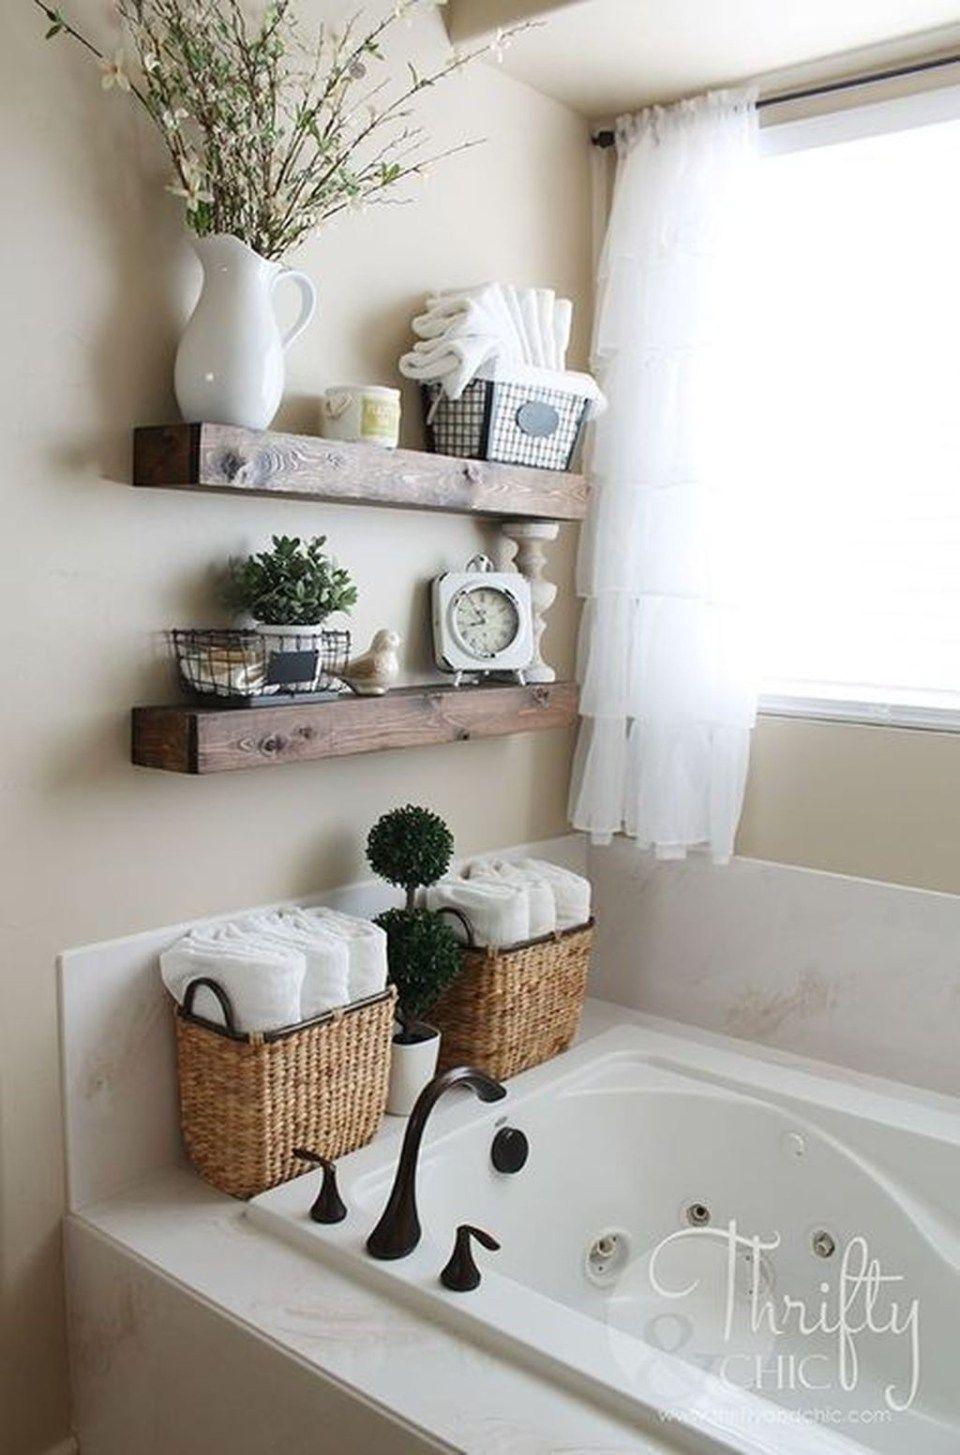 30 Unimaginable Diy Ideas For Bathroom Makeover House Redo